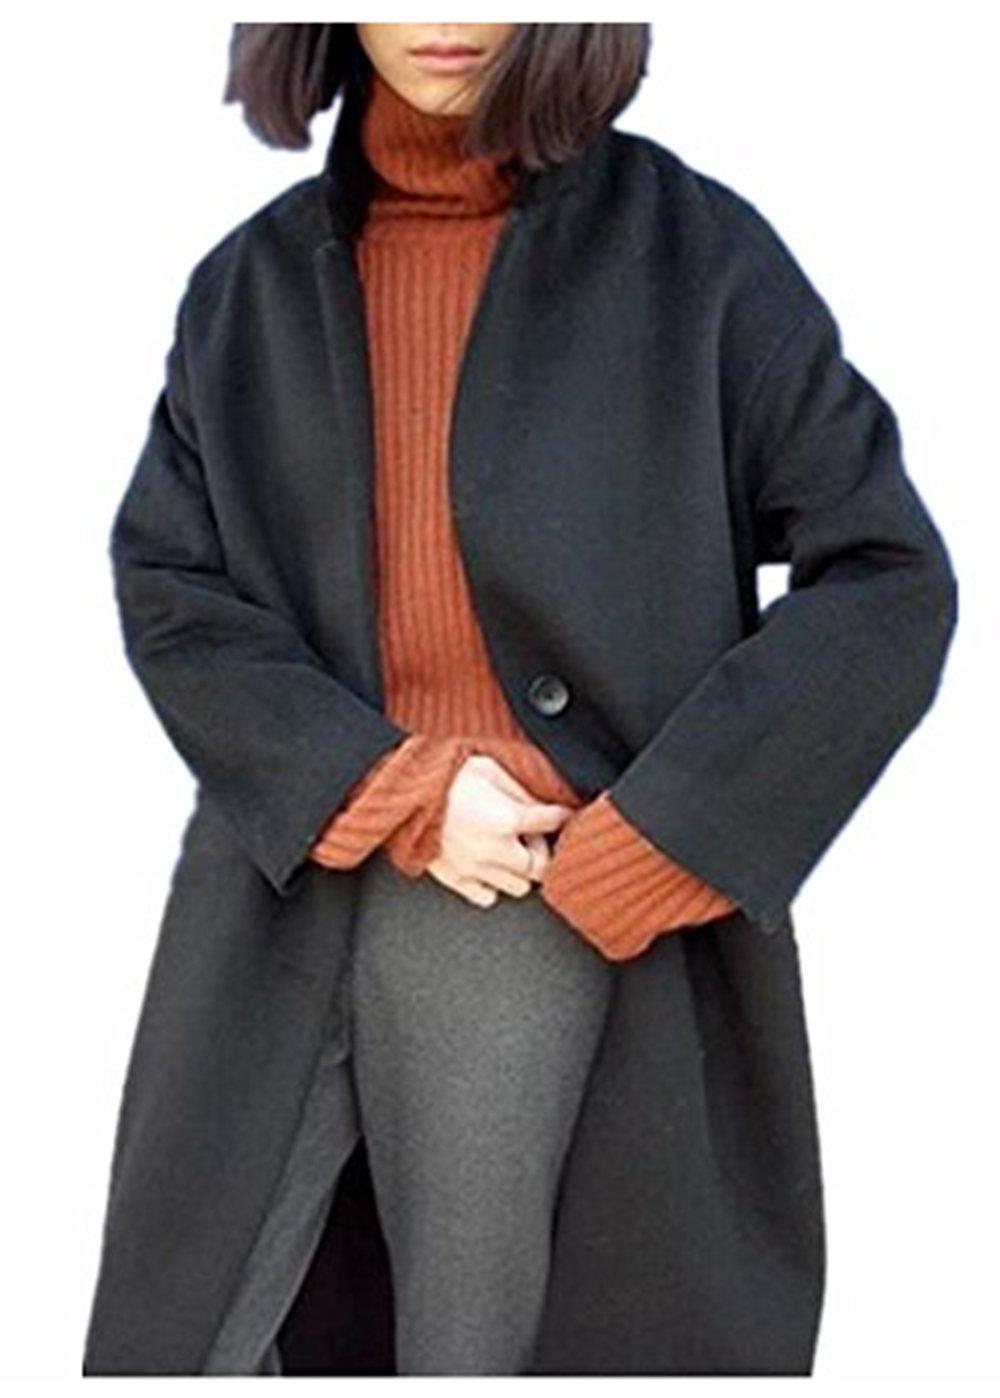 ForeMode Women Winter Single-Breasted Long Wool Coat(Black M)